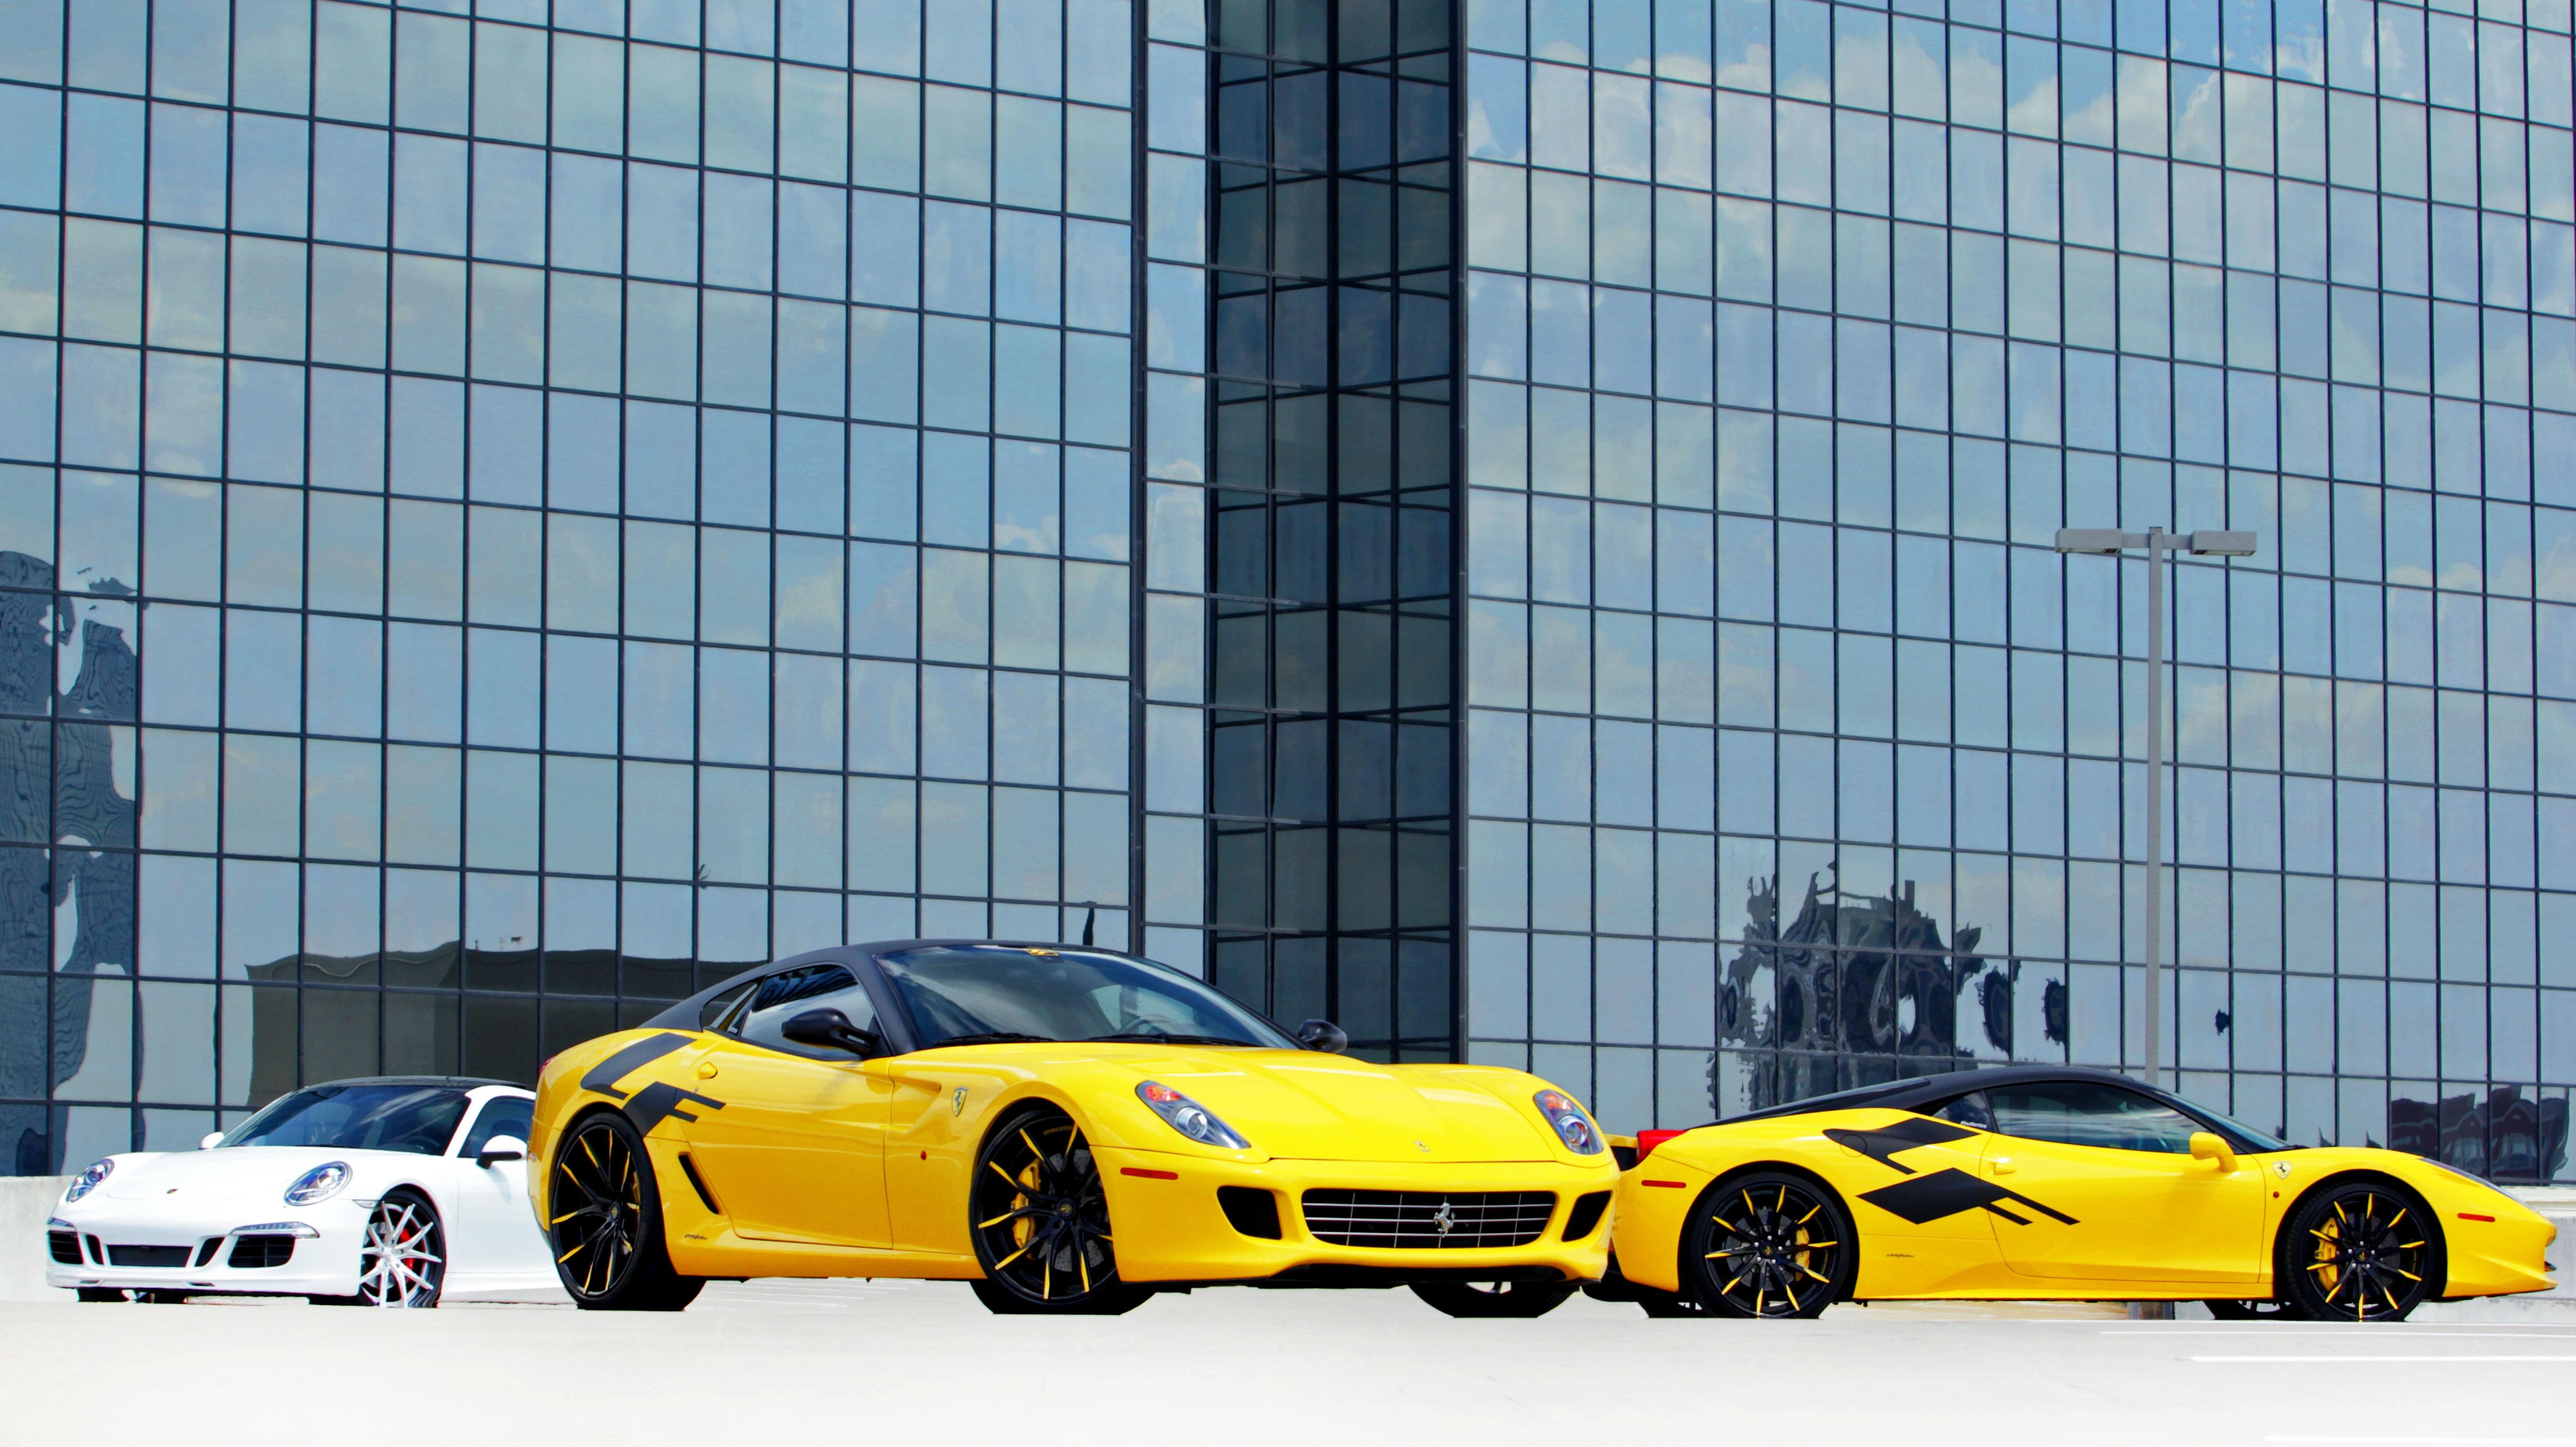 Atlanta Tour|  2013 Porsche 911 with LZ-102 2013 Ferrari 599 with LZ-102  2013 Ferrari 599 GTB Fiorano And the 2013 Ferrari 458 Italia